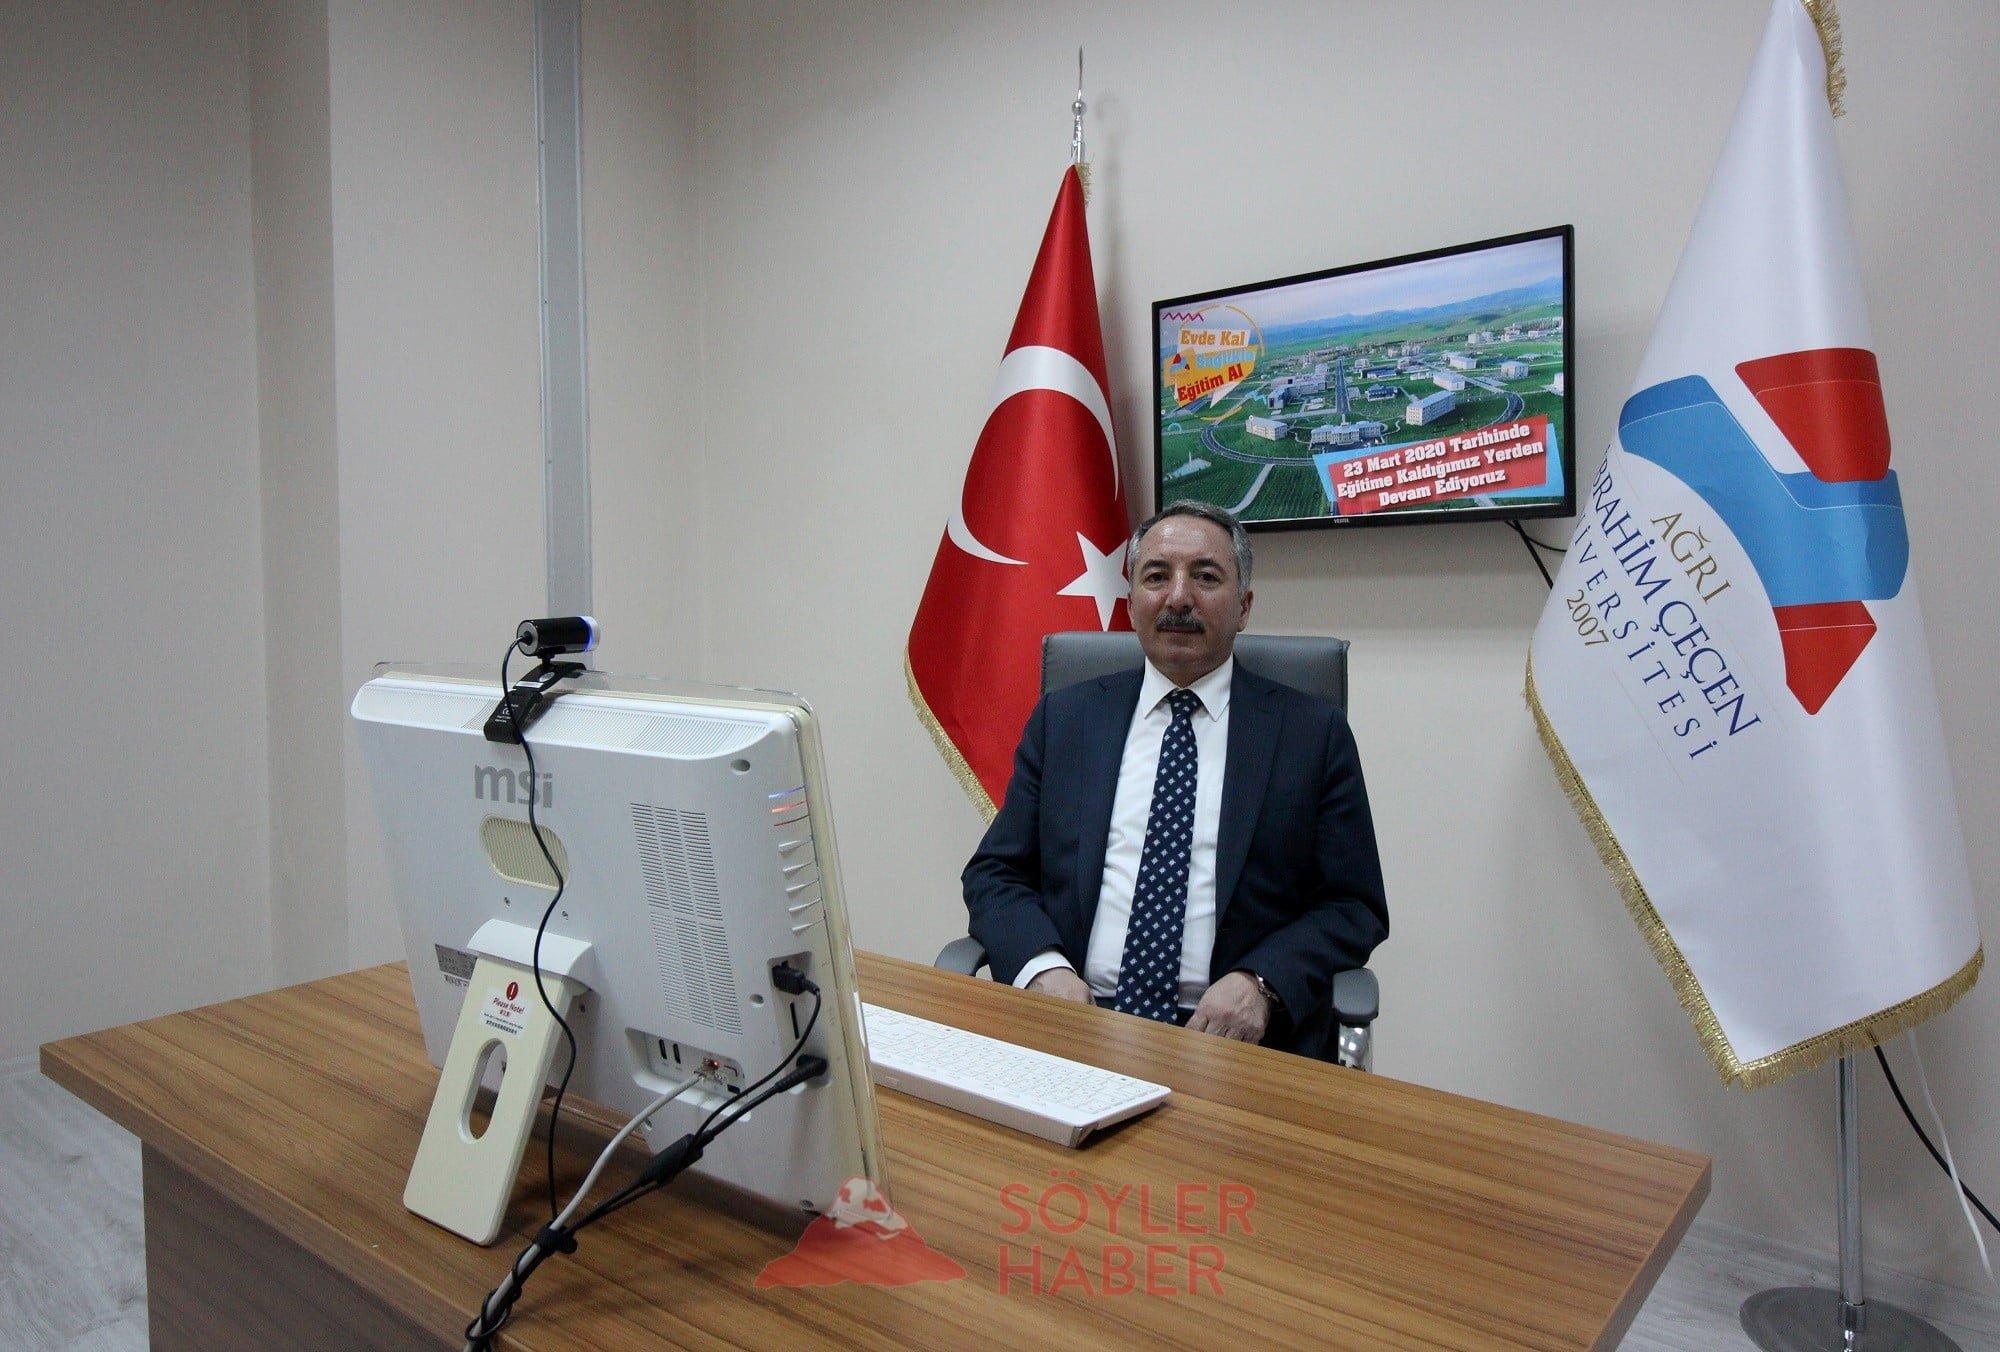 AİÇÜ RAKTÖRÜ PROF.DR.KARABULUT'UN BAYRAM MESAJI